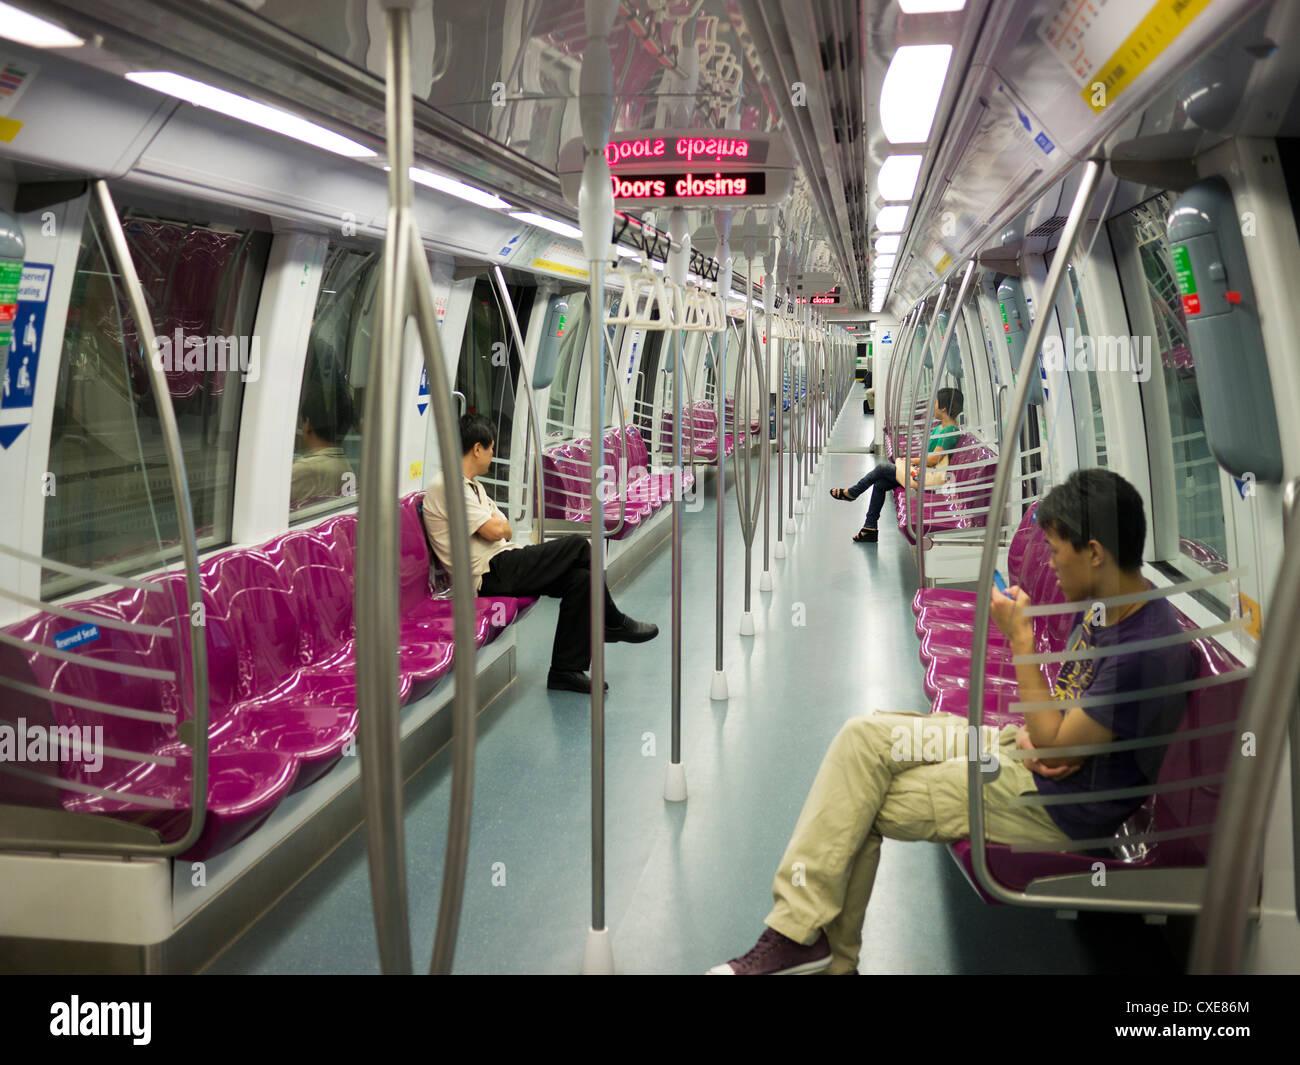 Mass Rapid Transit (MRT) Interior of carriage, Singapore - Stock Image